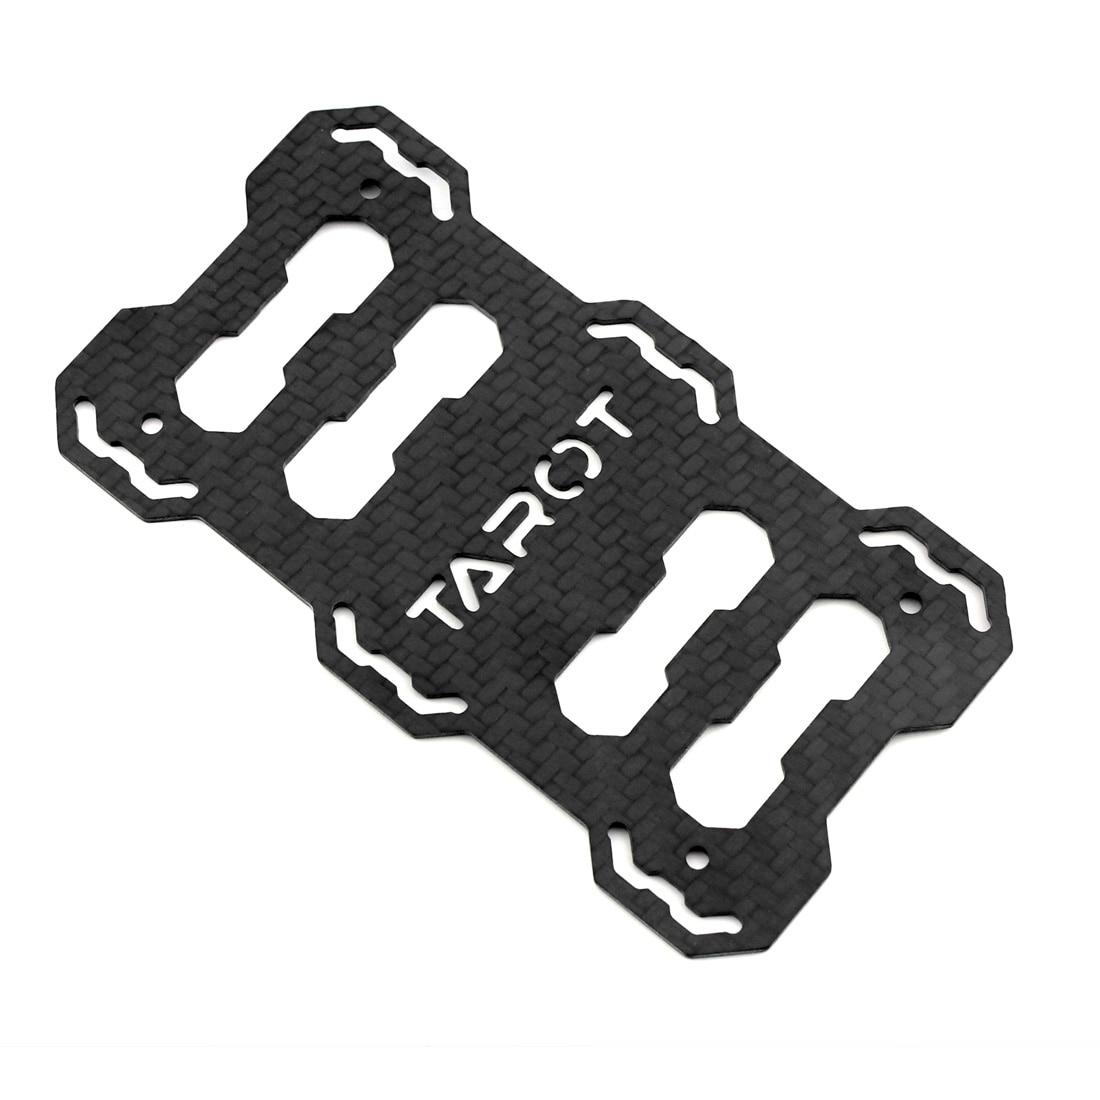 f05551 tarot 3k carbon battery mount plate tl65b03 for fy 650 CC3D Tricopter tarot 3k carbon battery mount plate tl65b03 for fy 650 folding main frame set quadcopter